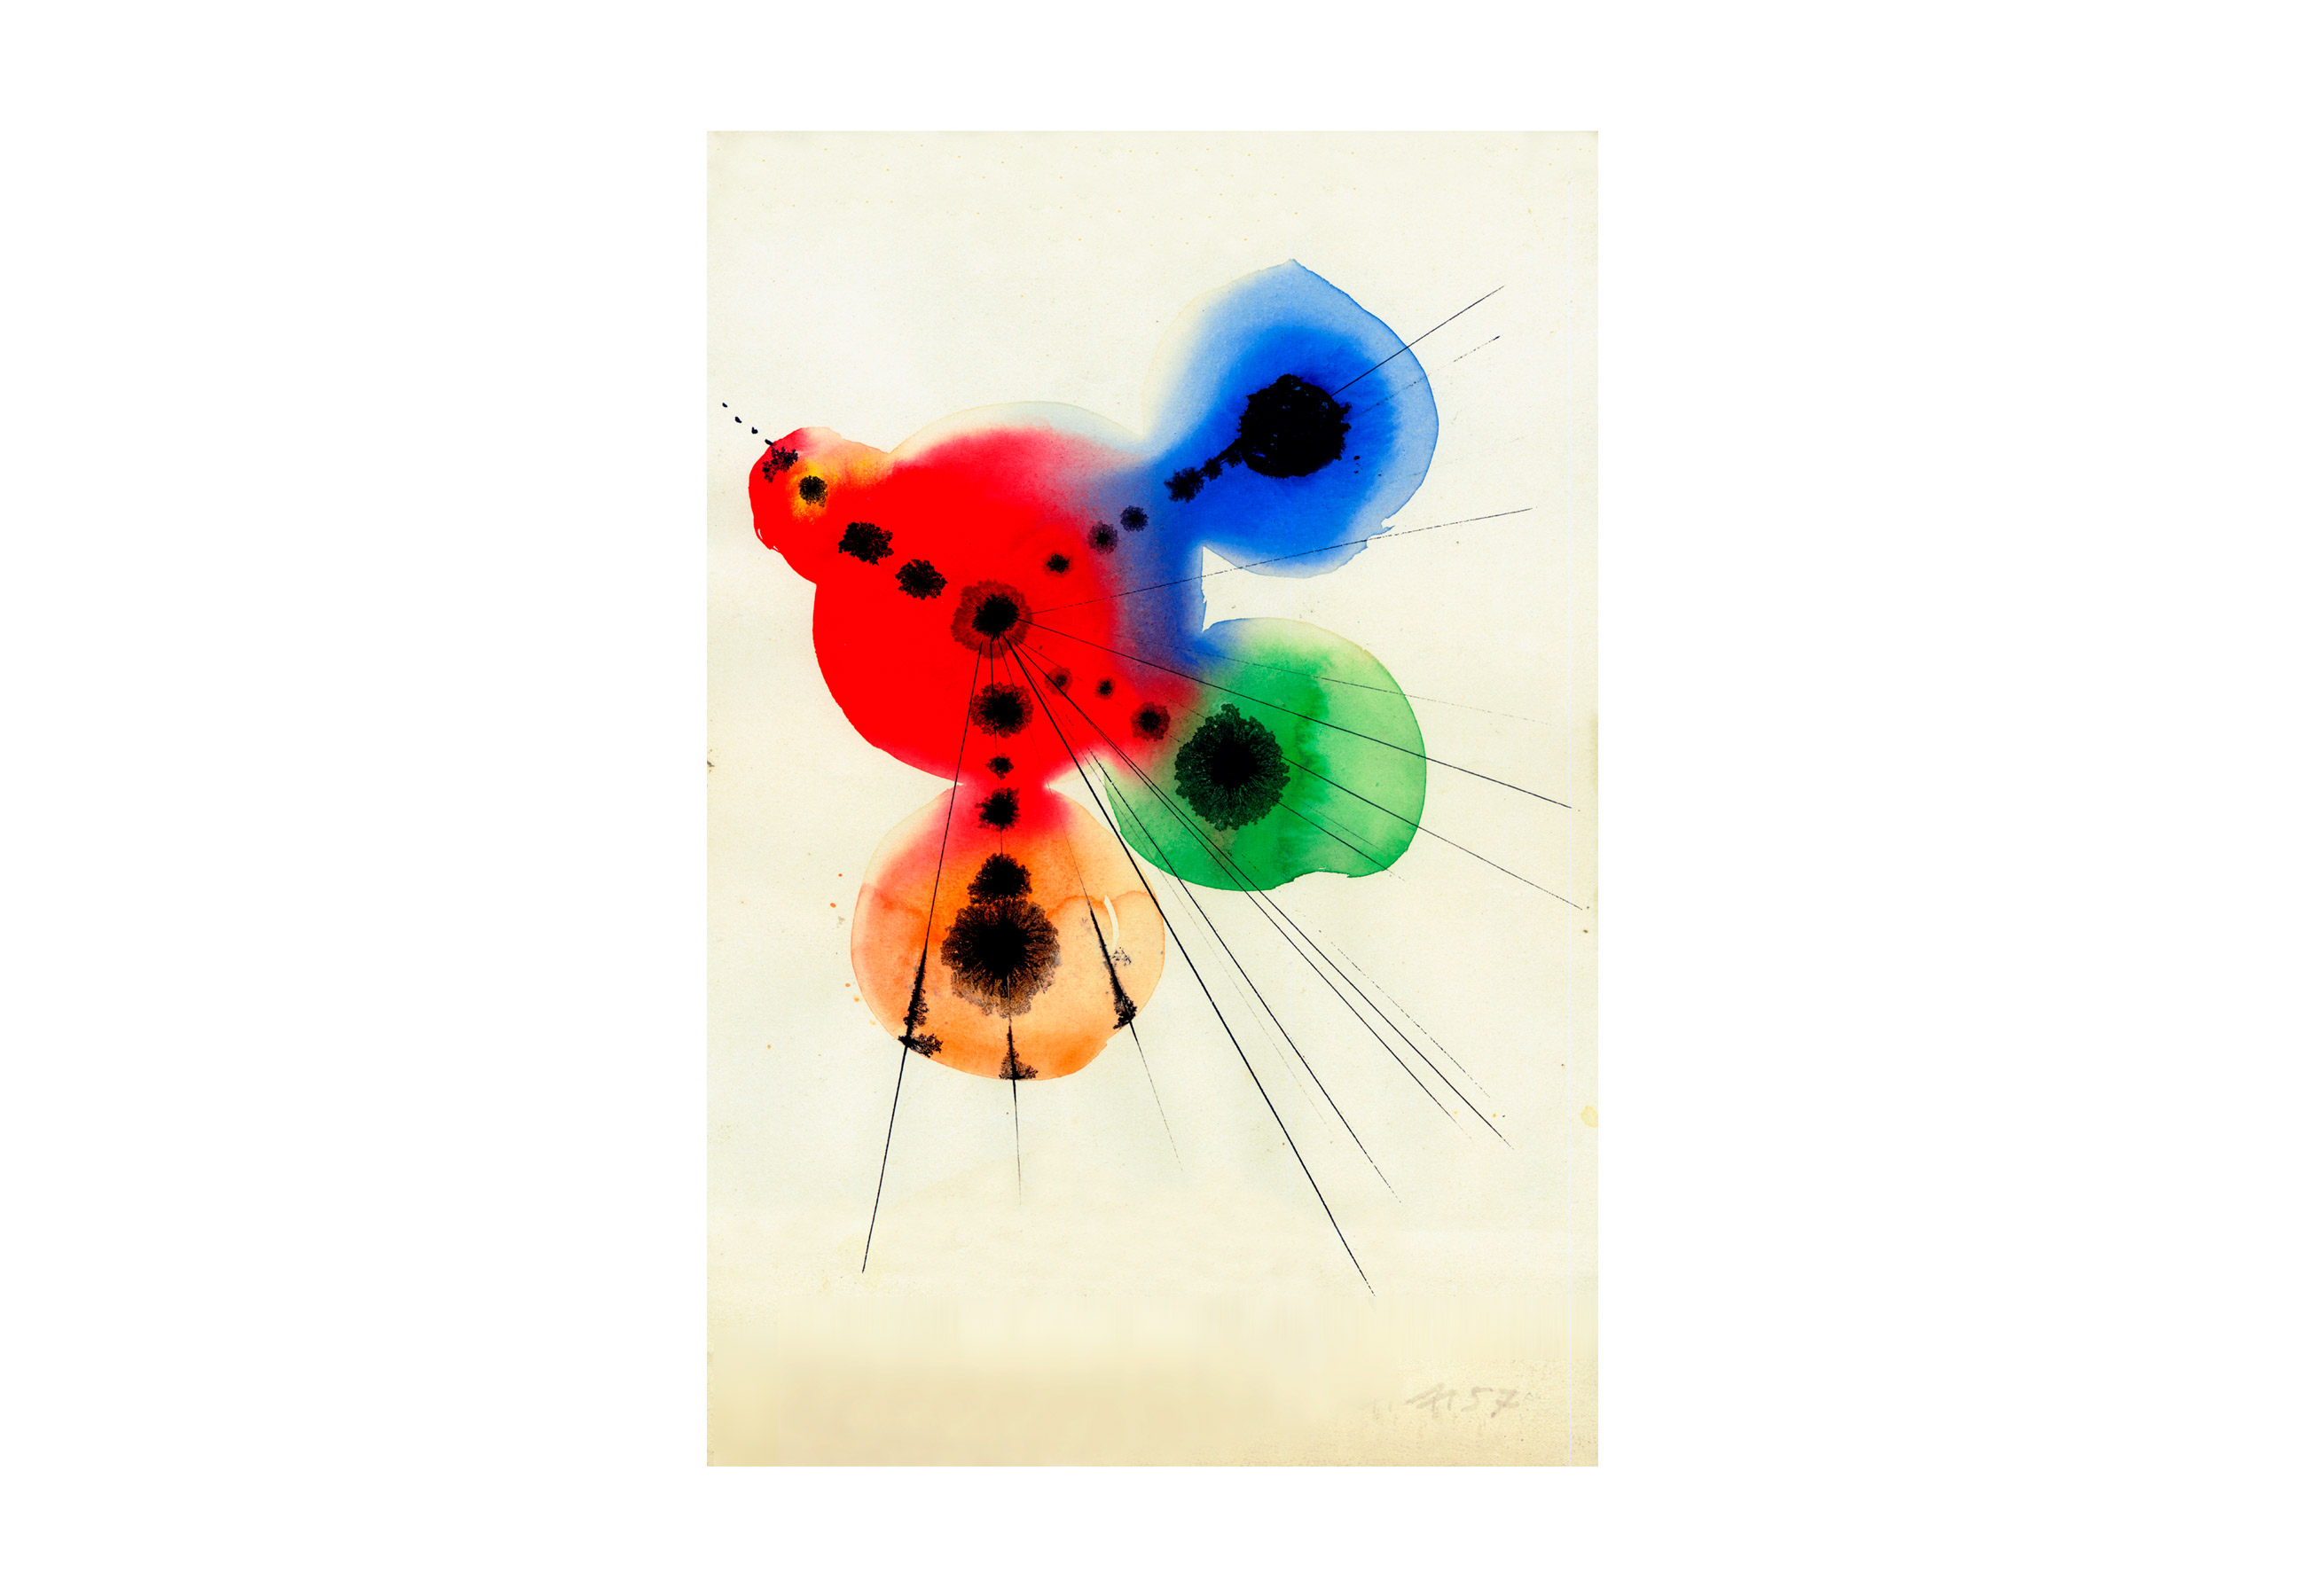 Lamm-Portfolio-1956-59-17.jpg